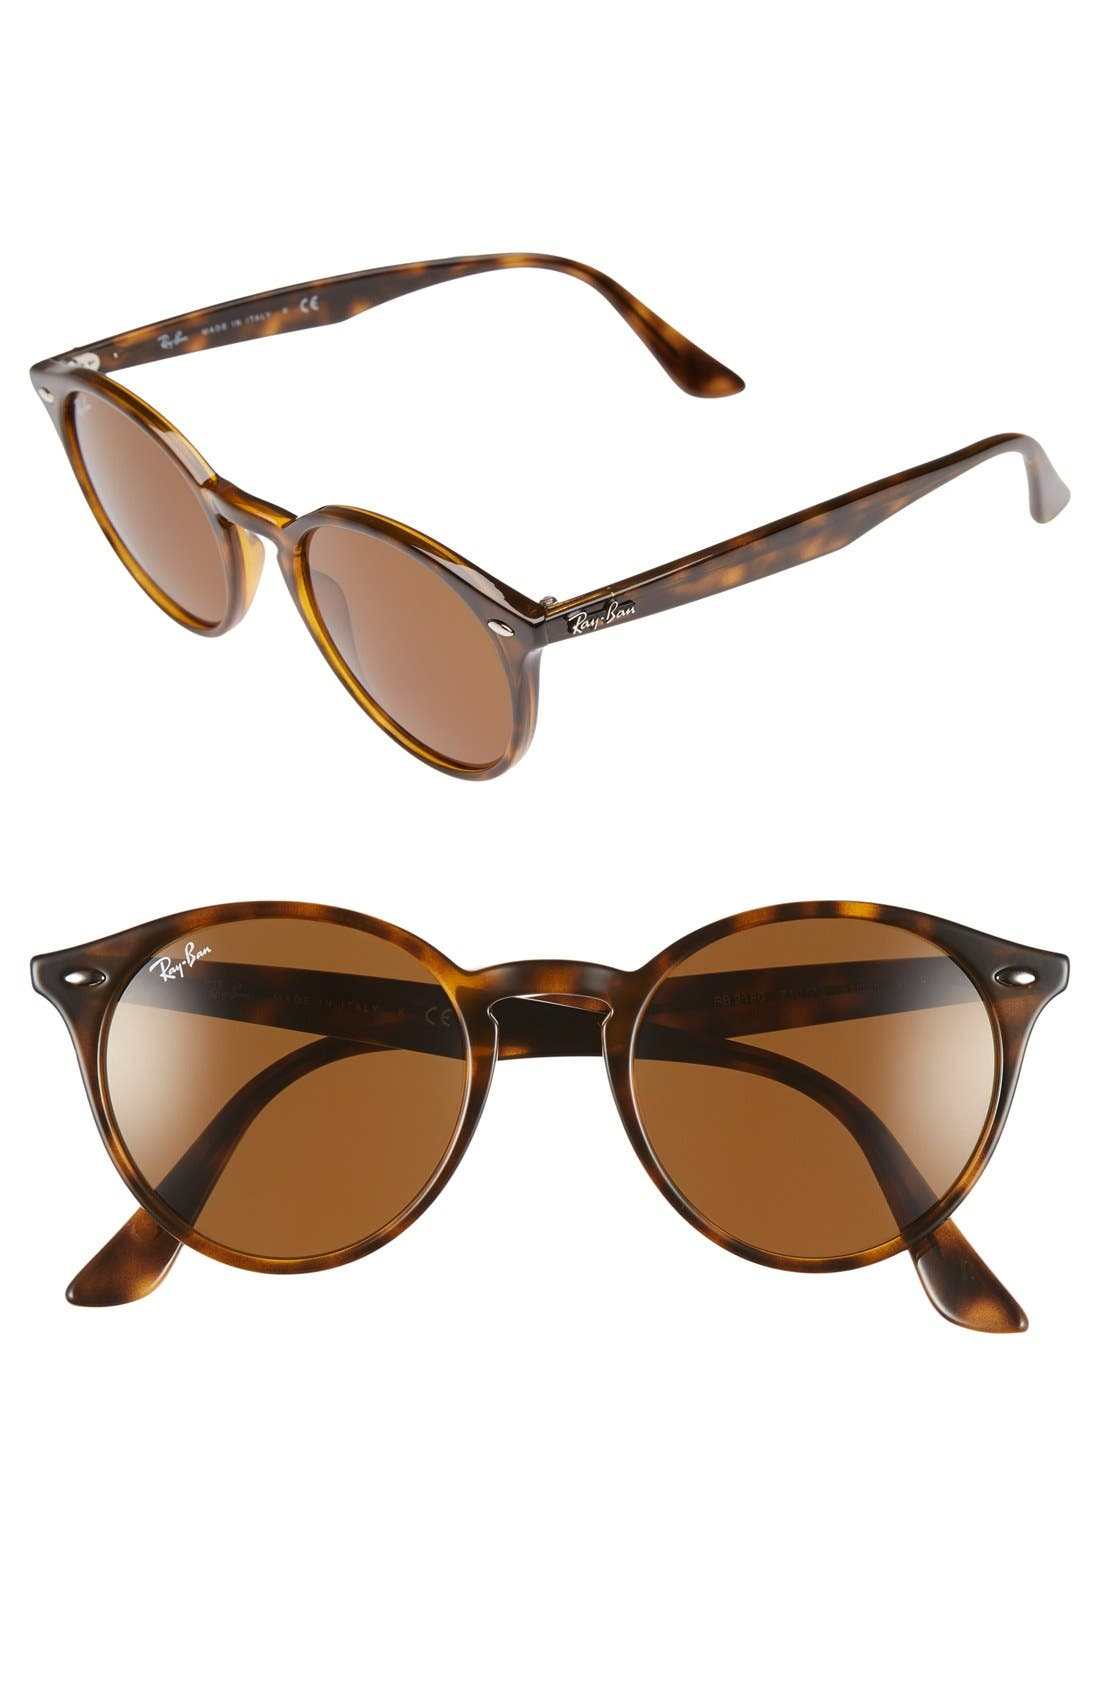 Highstreet 51mm Round Sunglasses,                         Main,                         color, DARK HAVANA